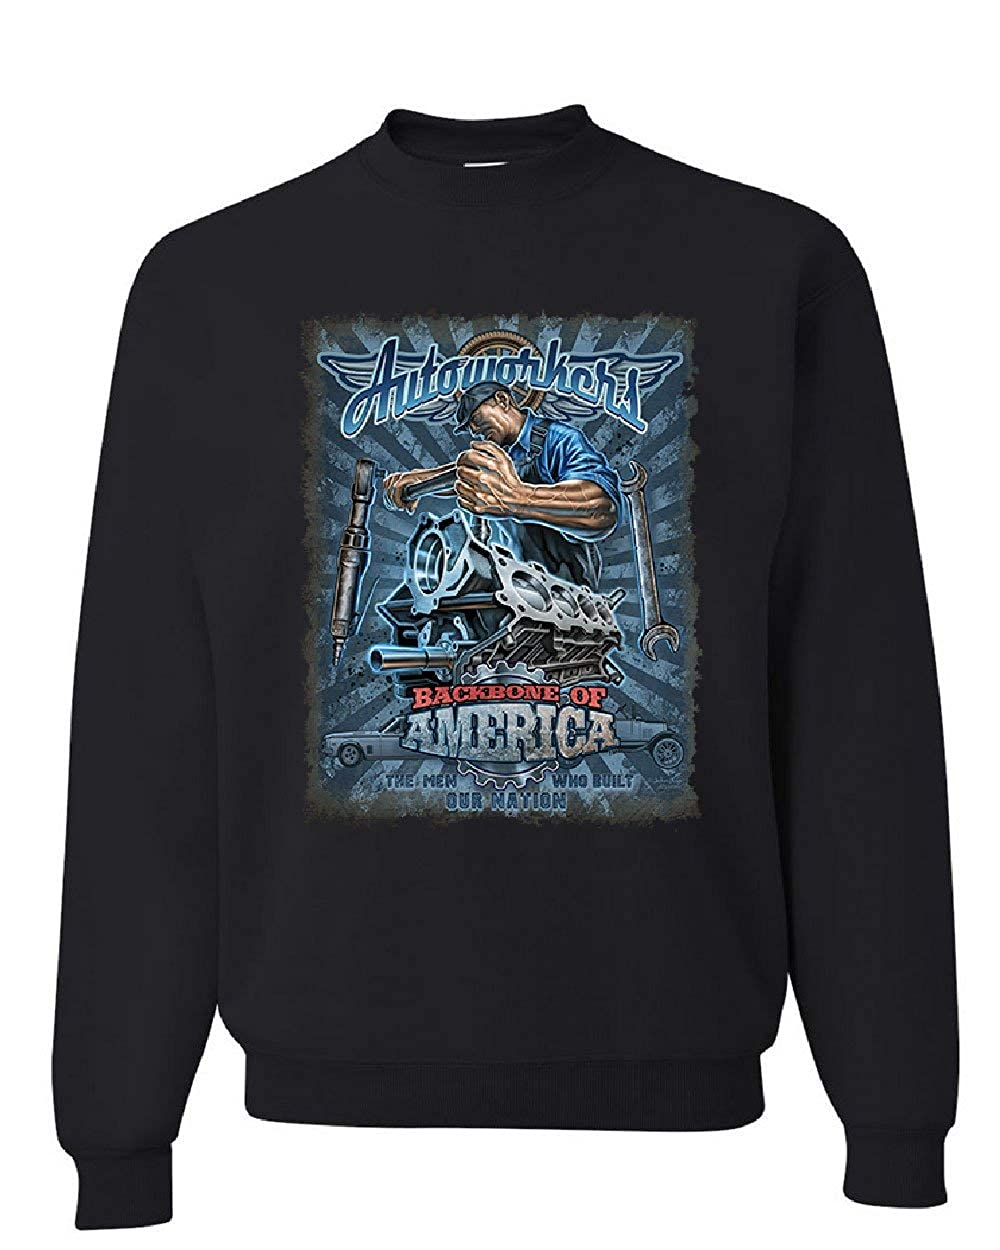 Autoworkers Backbone of America Sweatshirt Car Motor Mechanic Union Sweater